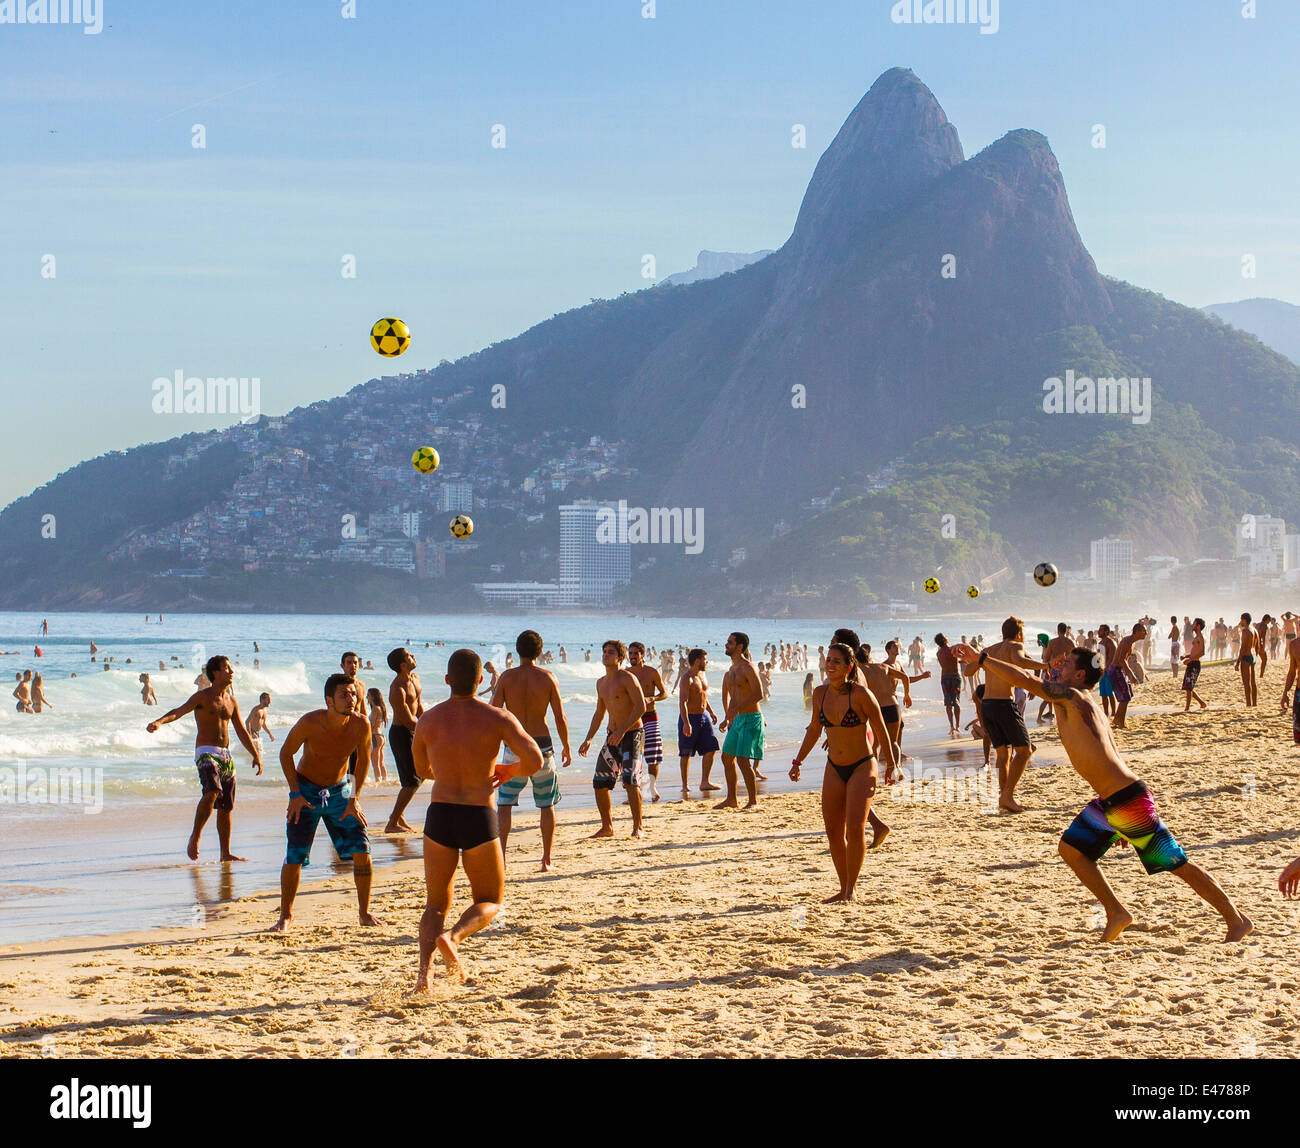 Ipanema, Rio de Janeiro, Brazil - Stock Image